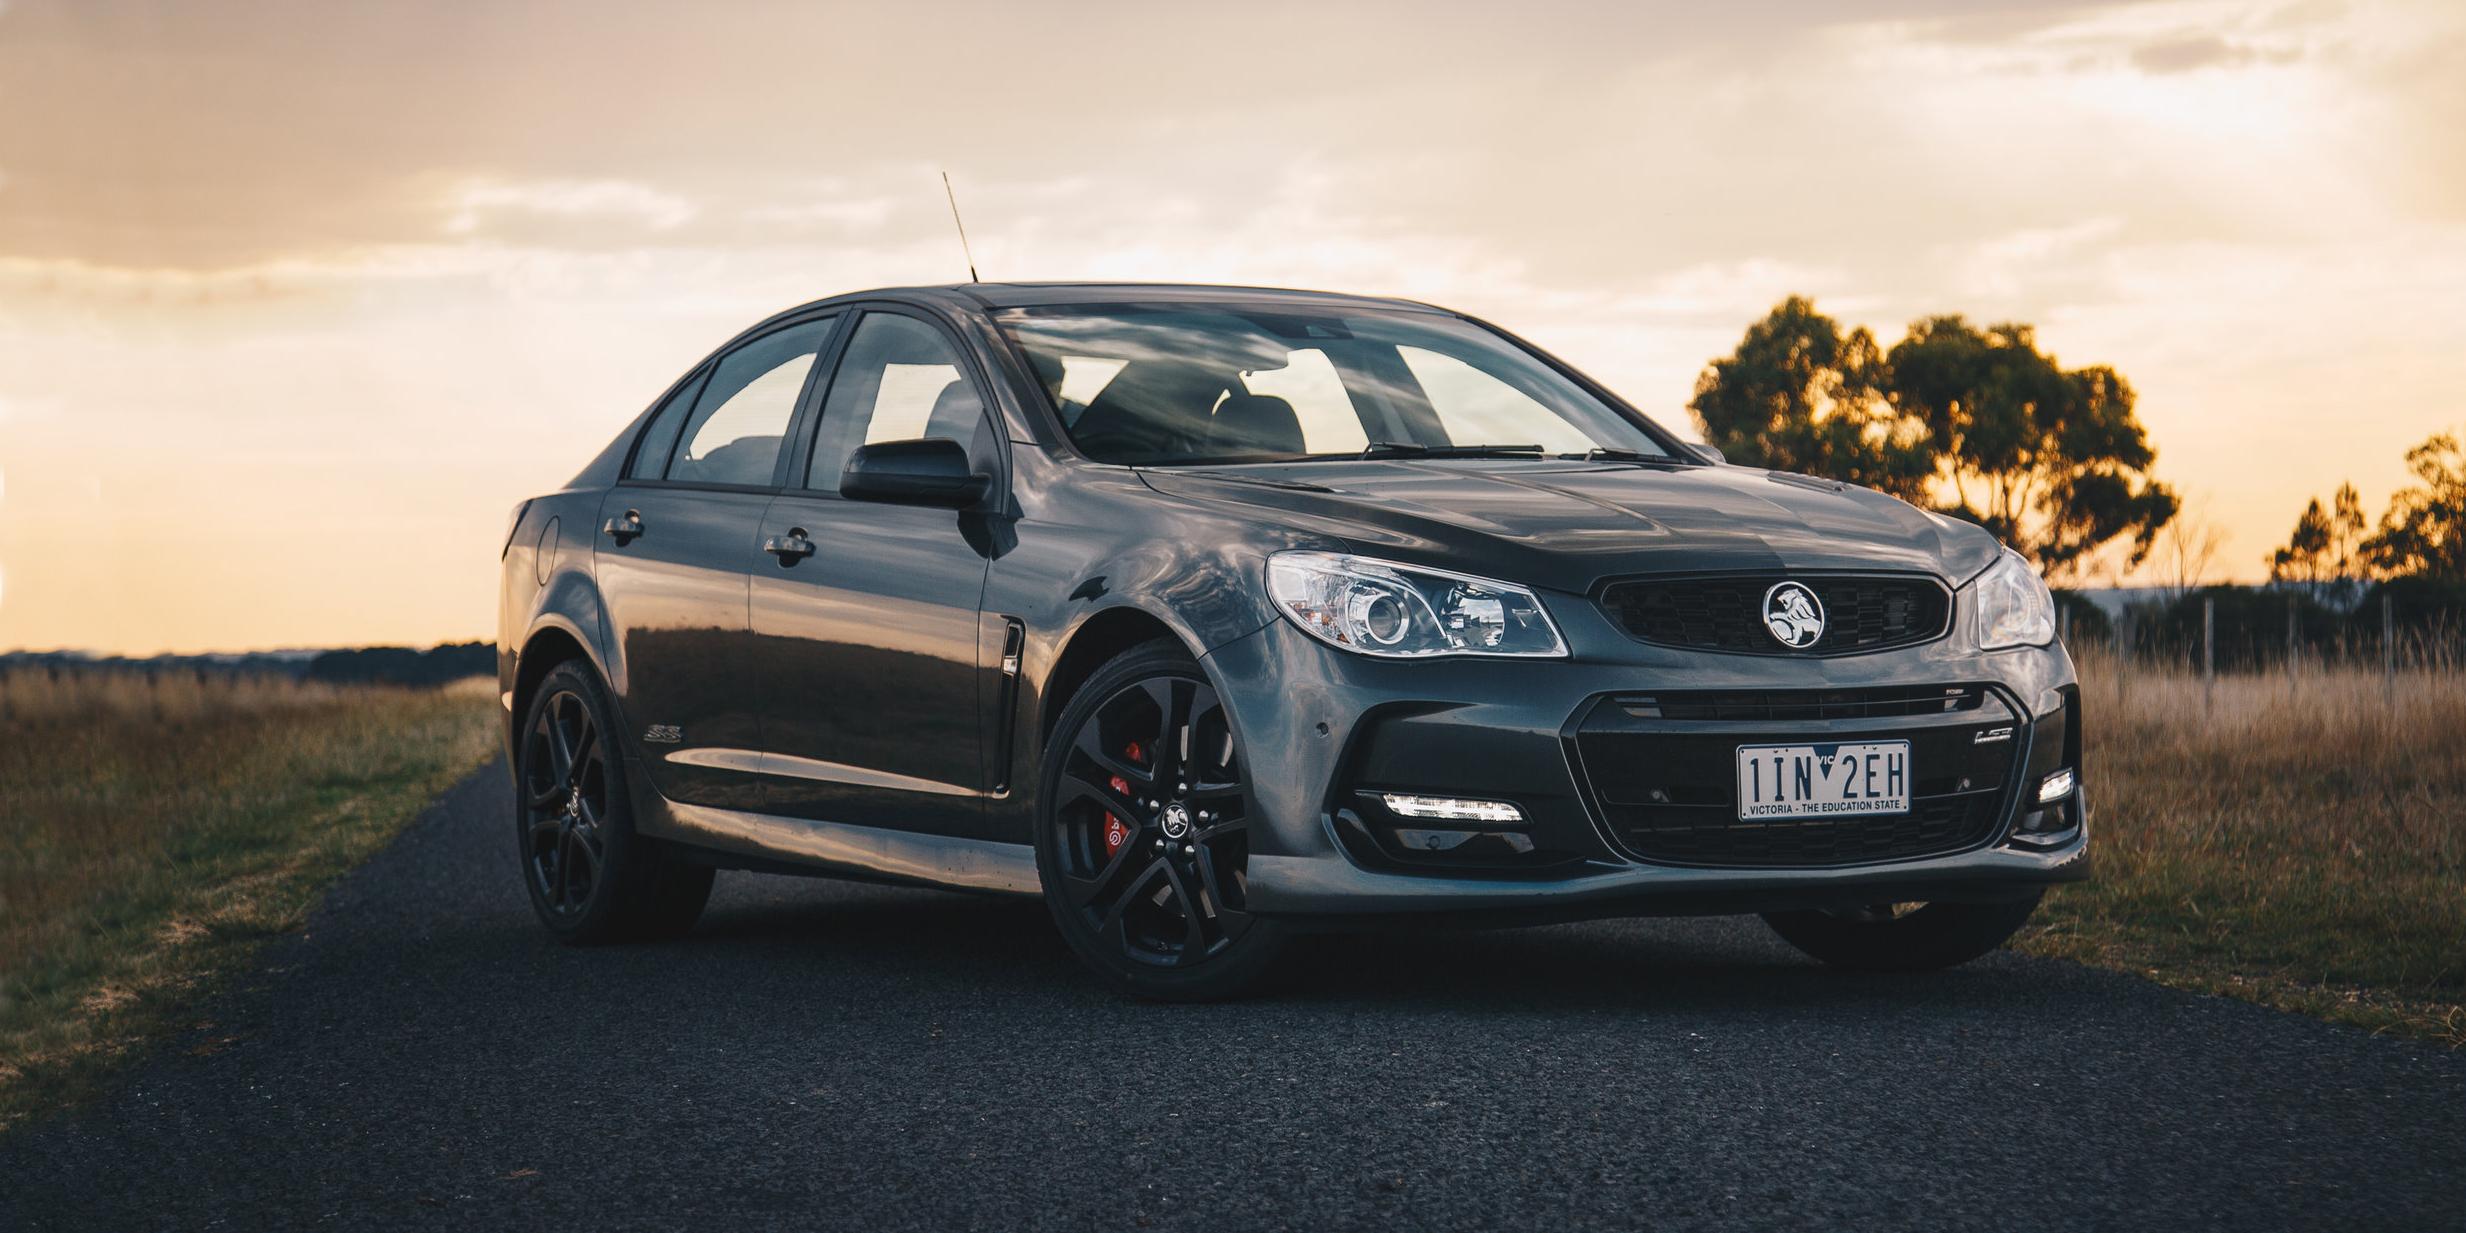 2017 Holden Commodore Ss V Redline Review Caradvice